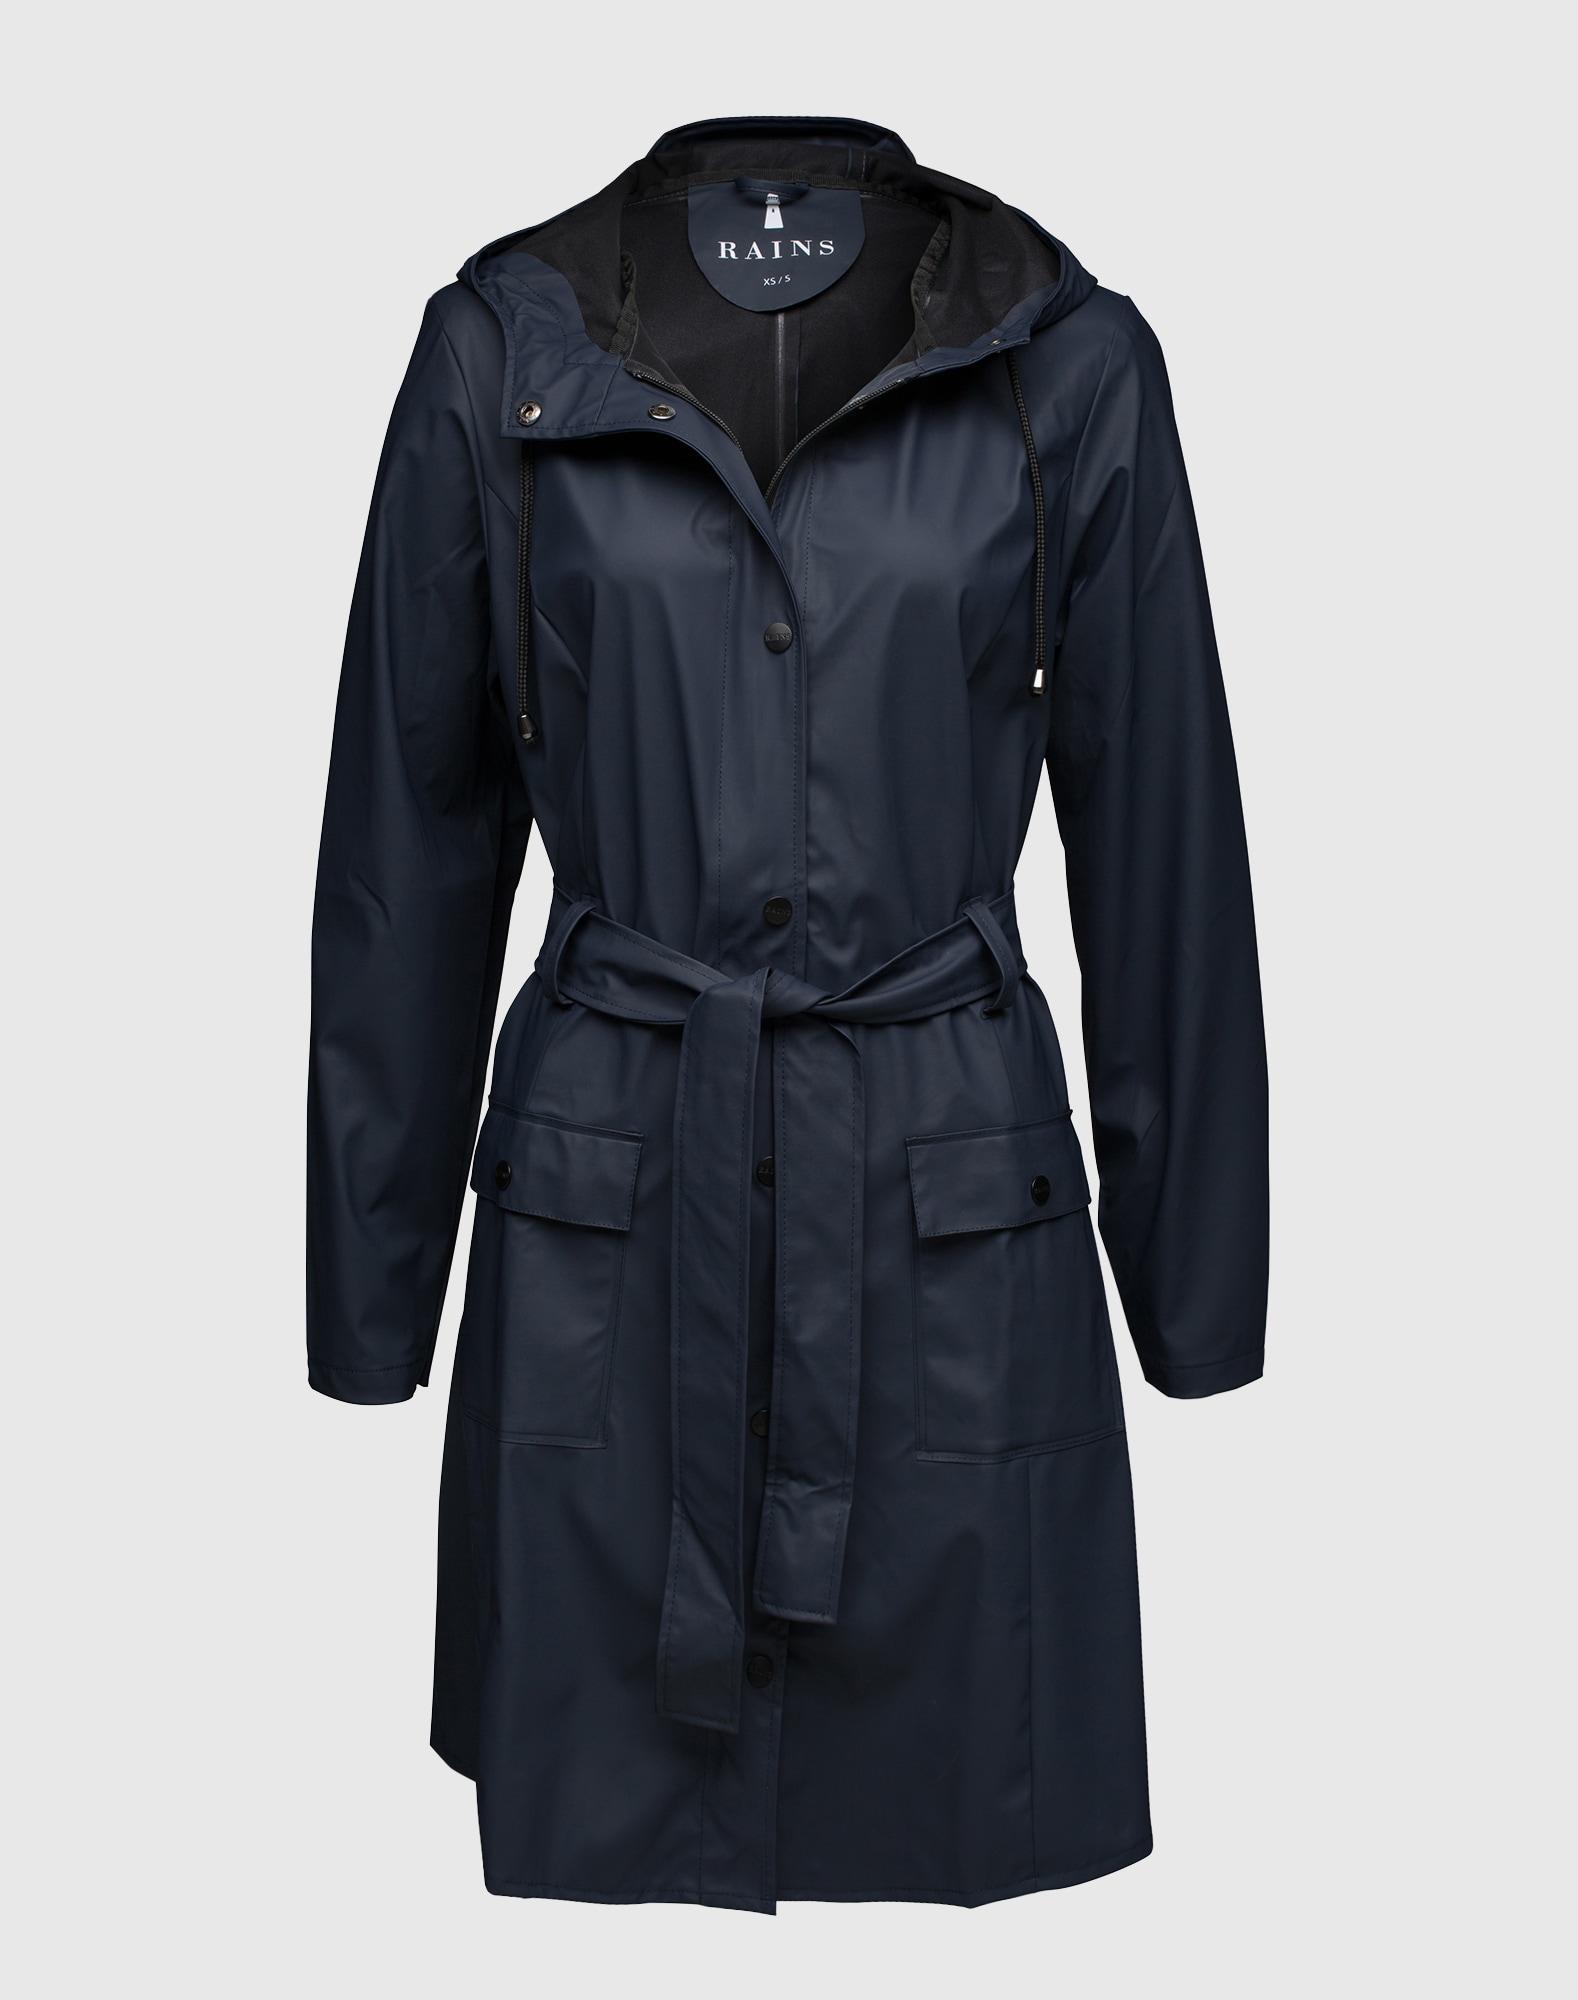 RAINS, Dames Functionele mantel, navy